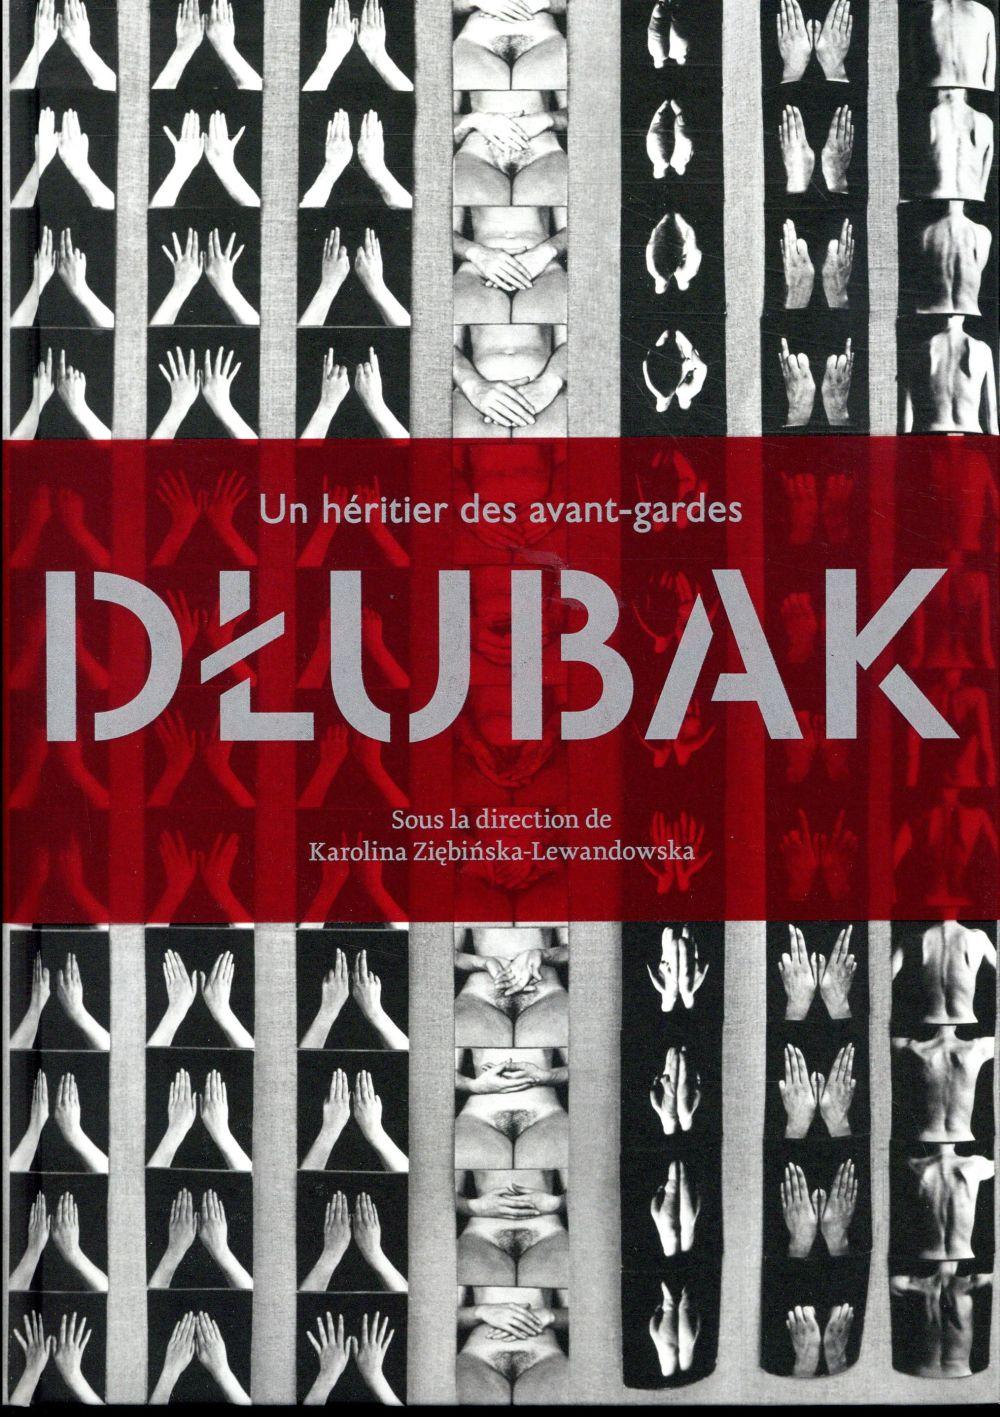 Un héritier des avant-gardes : Dlubak